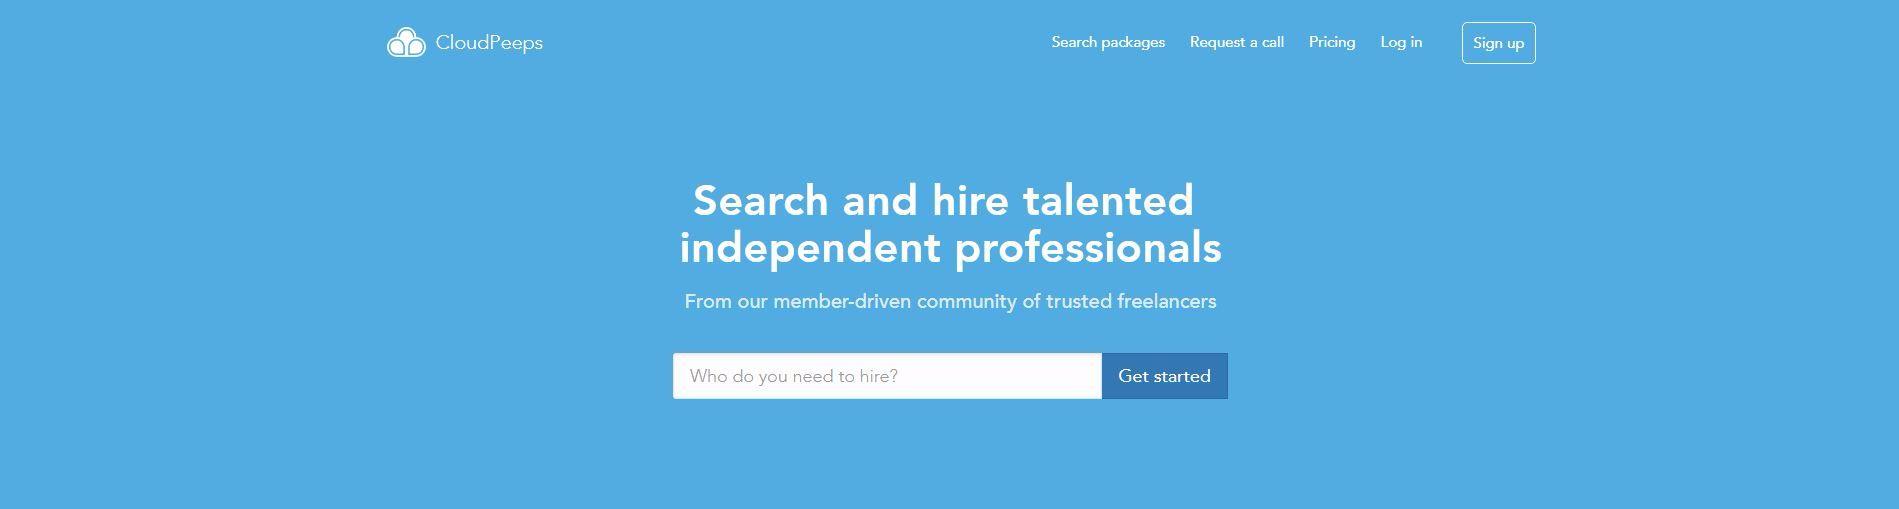 Cloudpeeps Freelance Marketplace